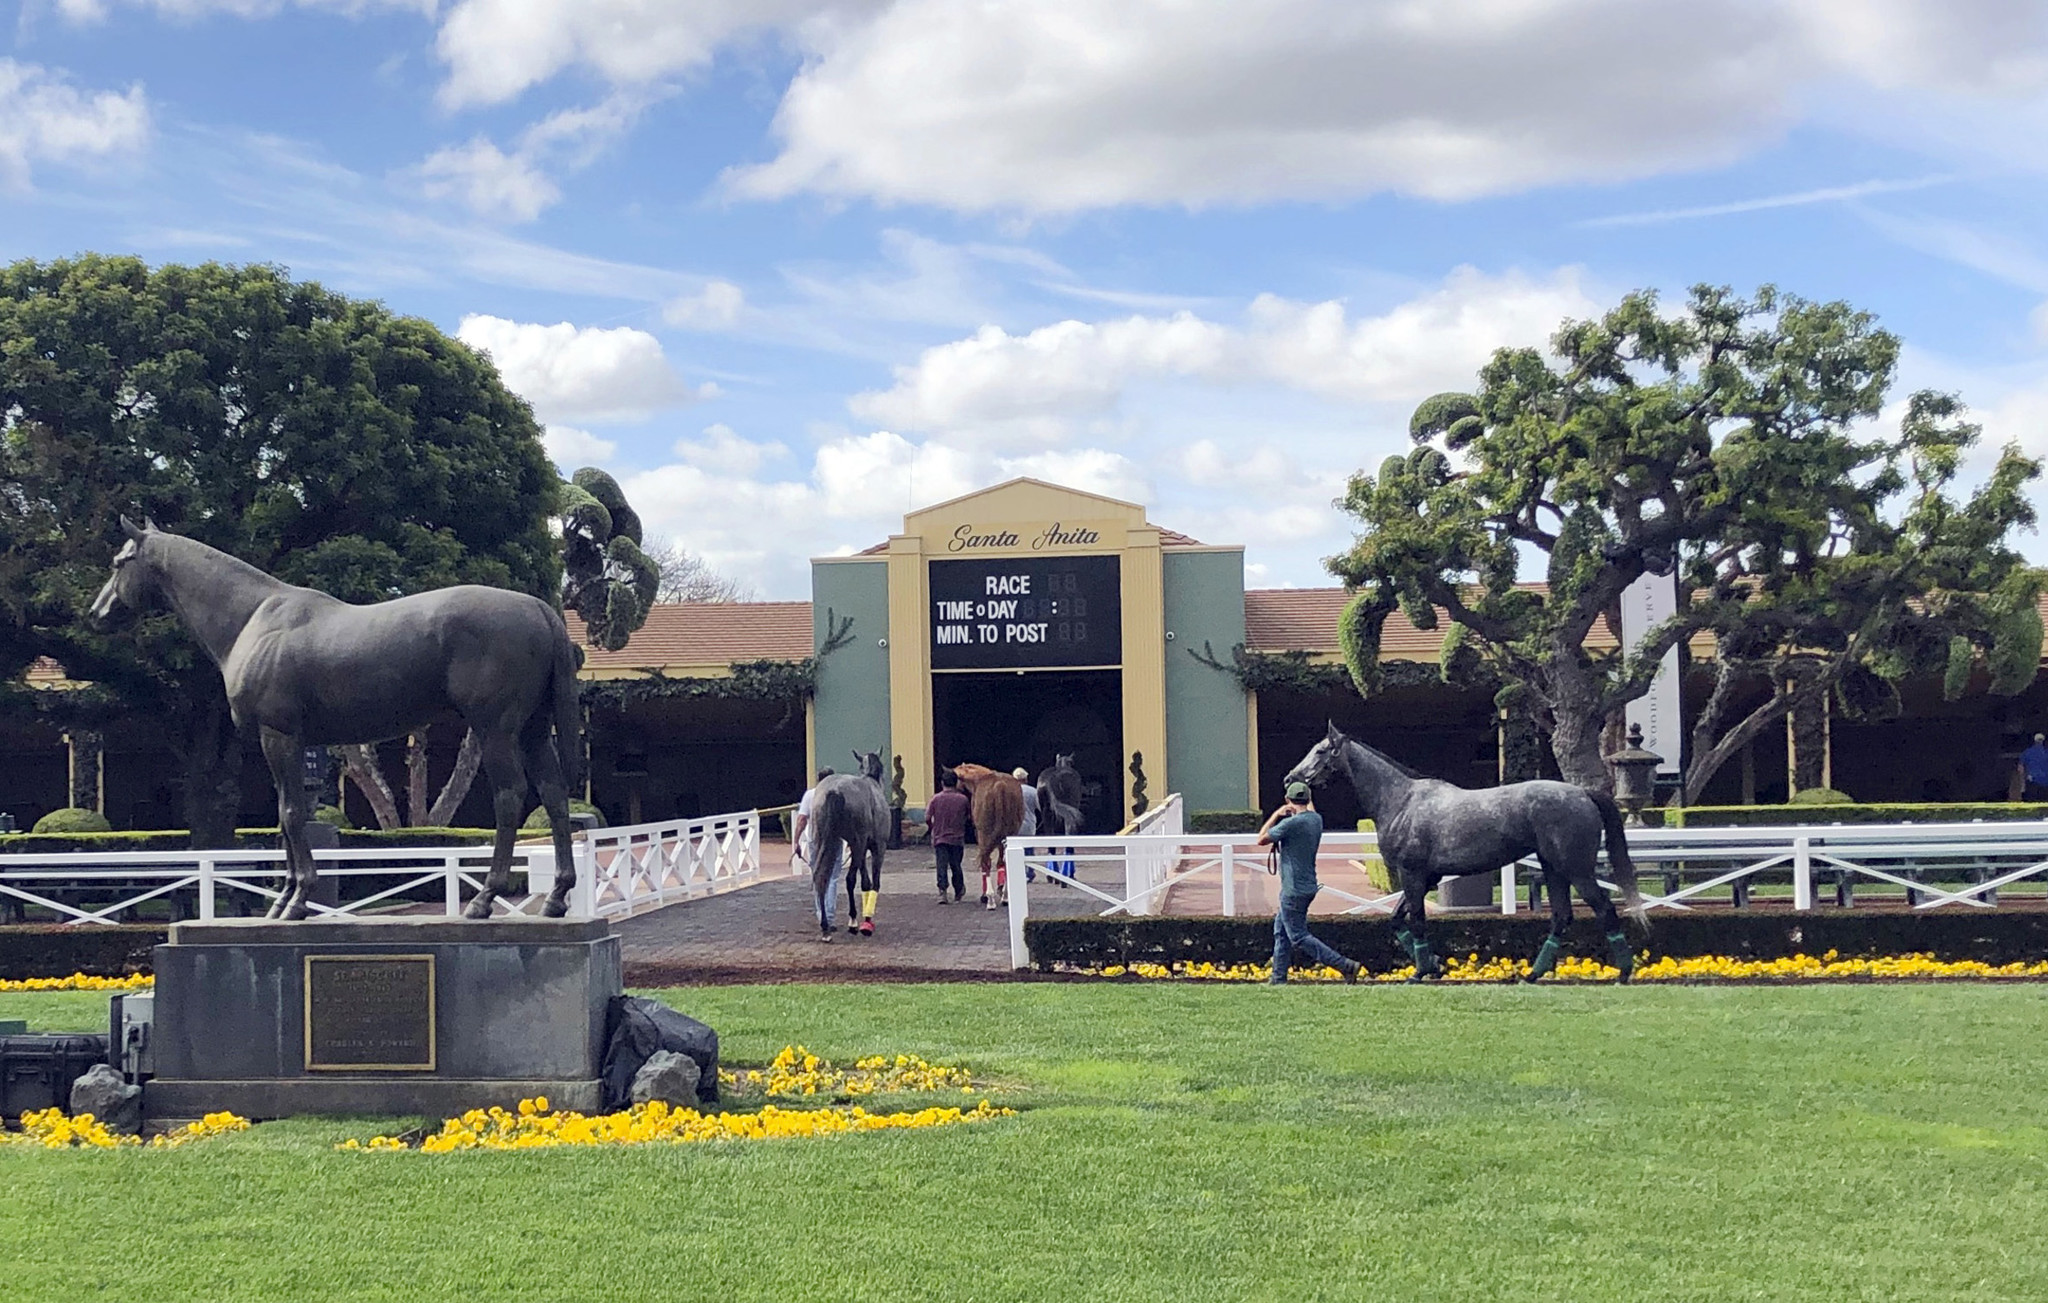 Third horse dies in three days at Santa Anita Park